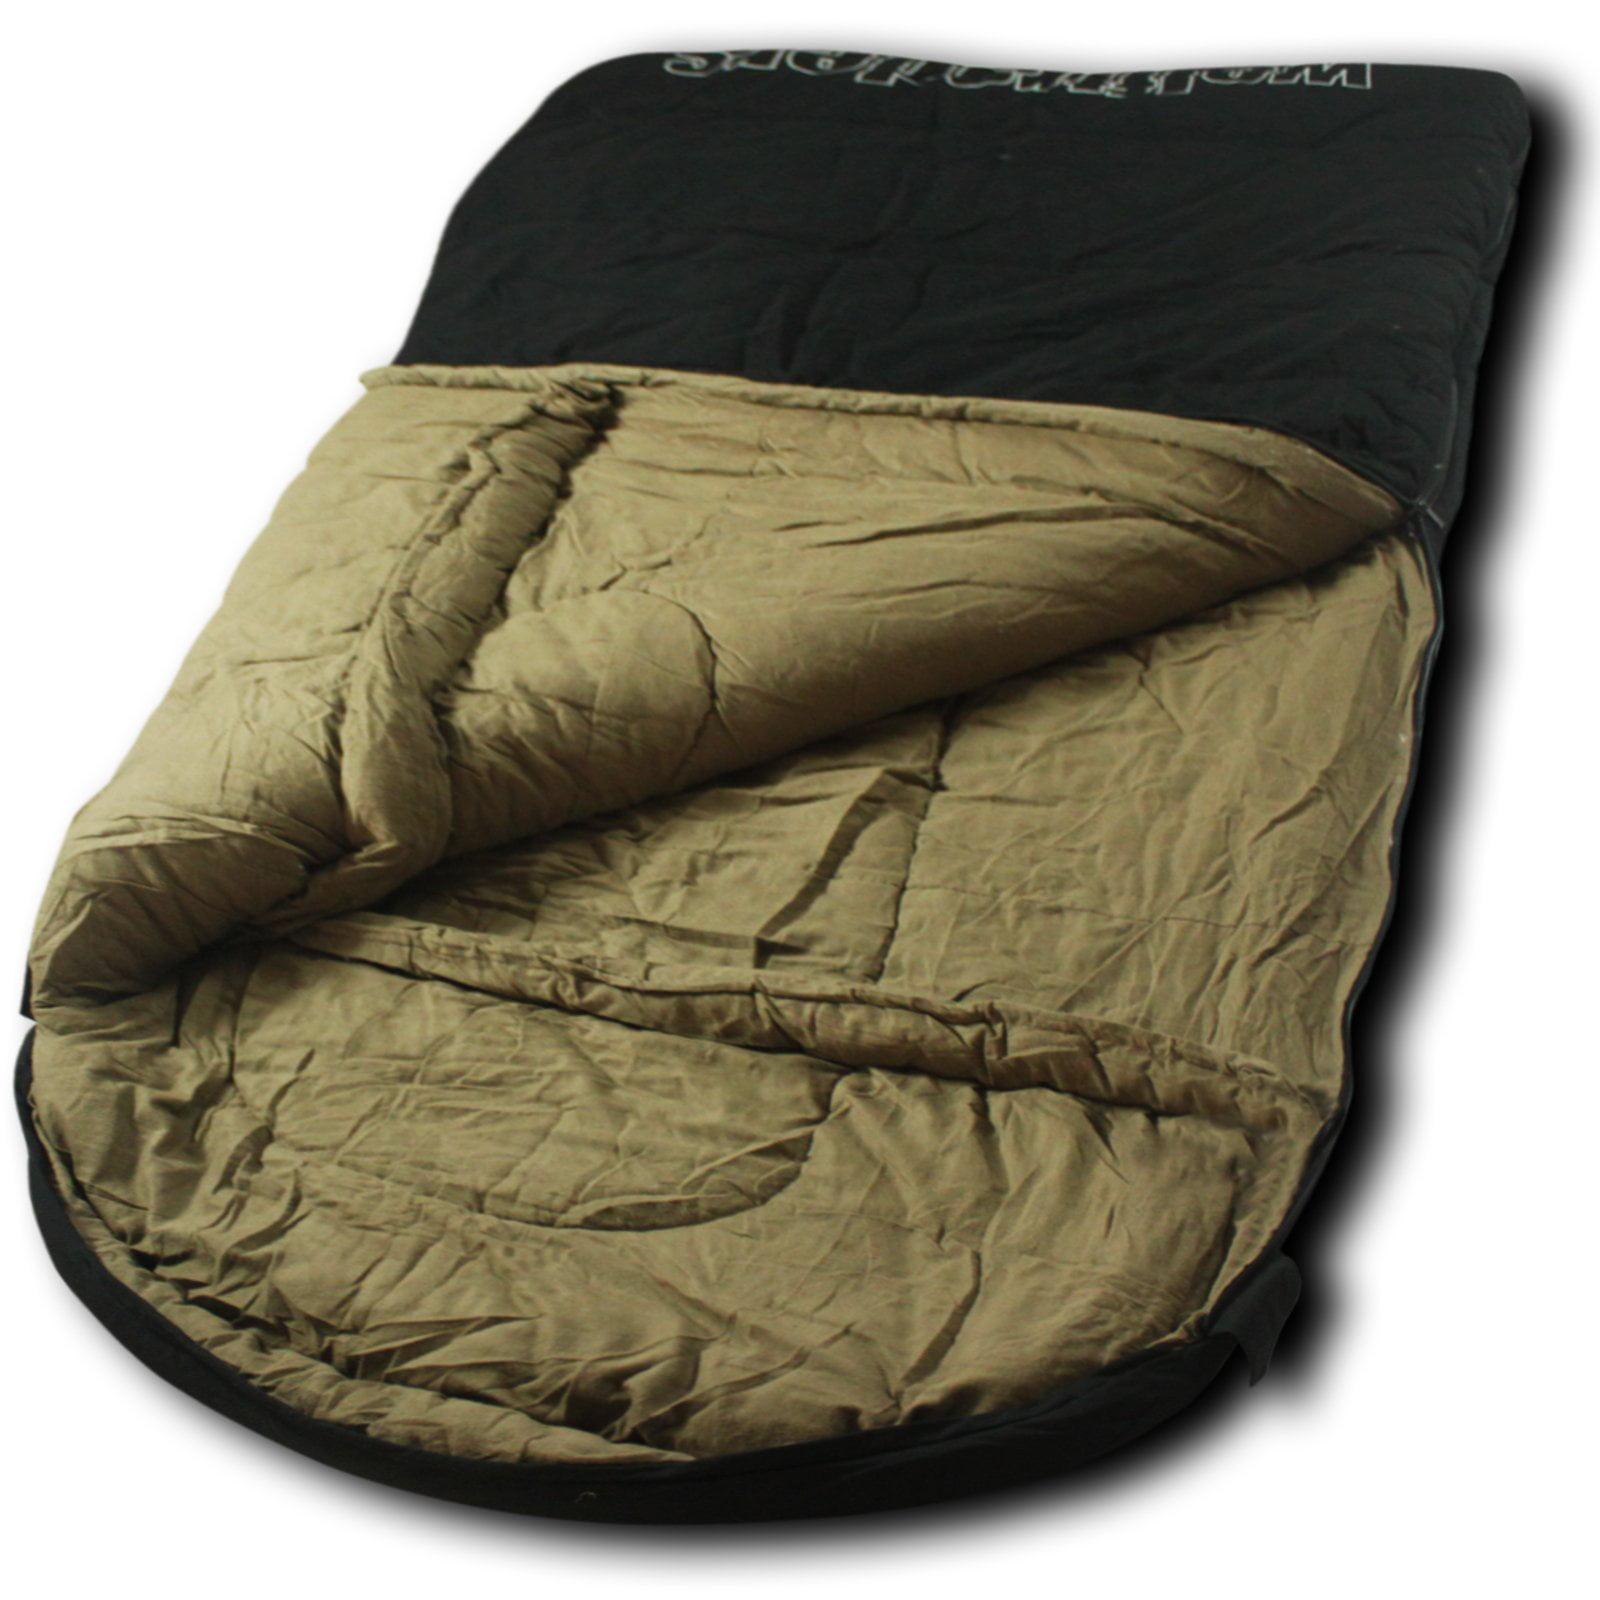 Wolftraders TwoWolves +0 Degree 2-Person Premium Canvas Sleeping Bag, Black/Tan